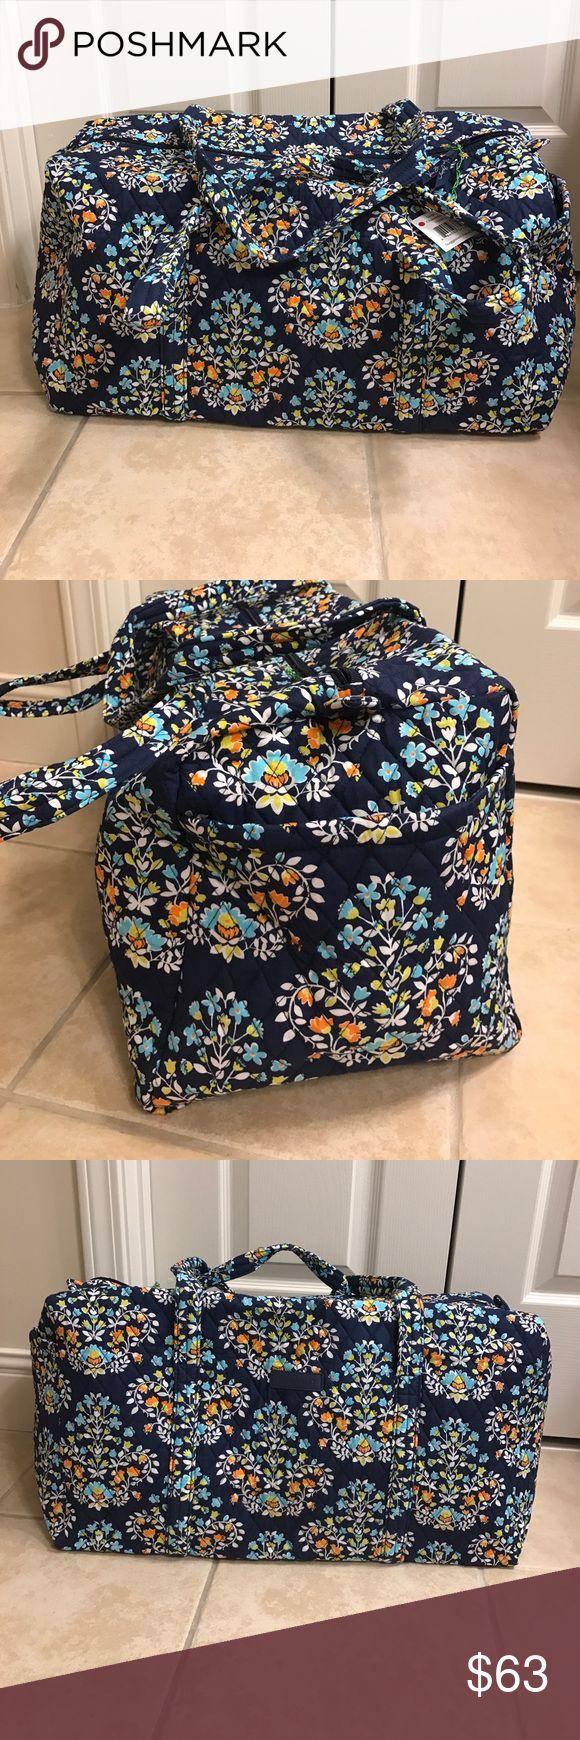 NWT Vera Bradley   large duffle bag  Travel Bags